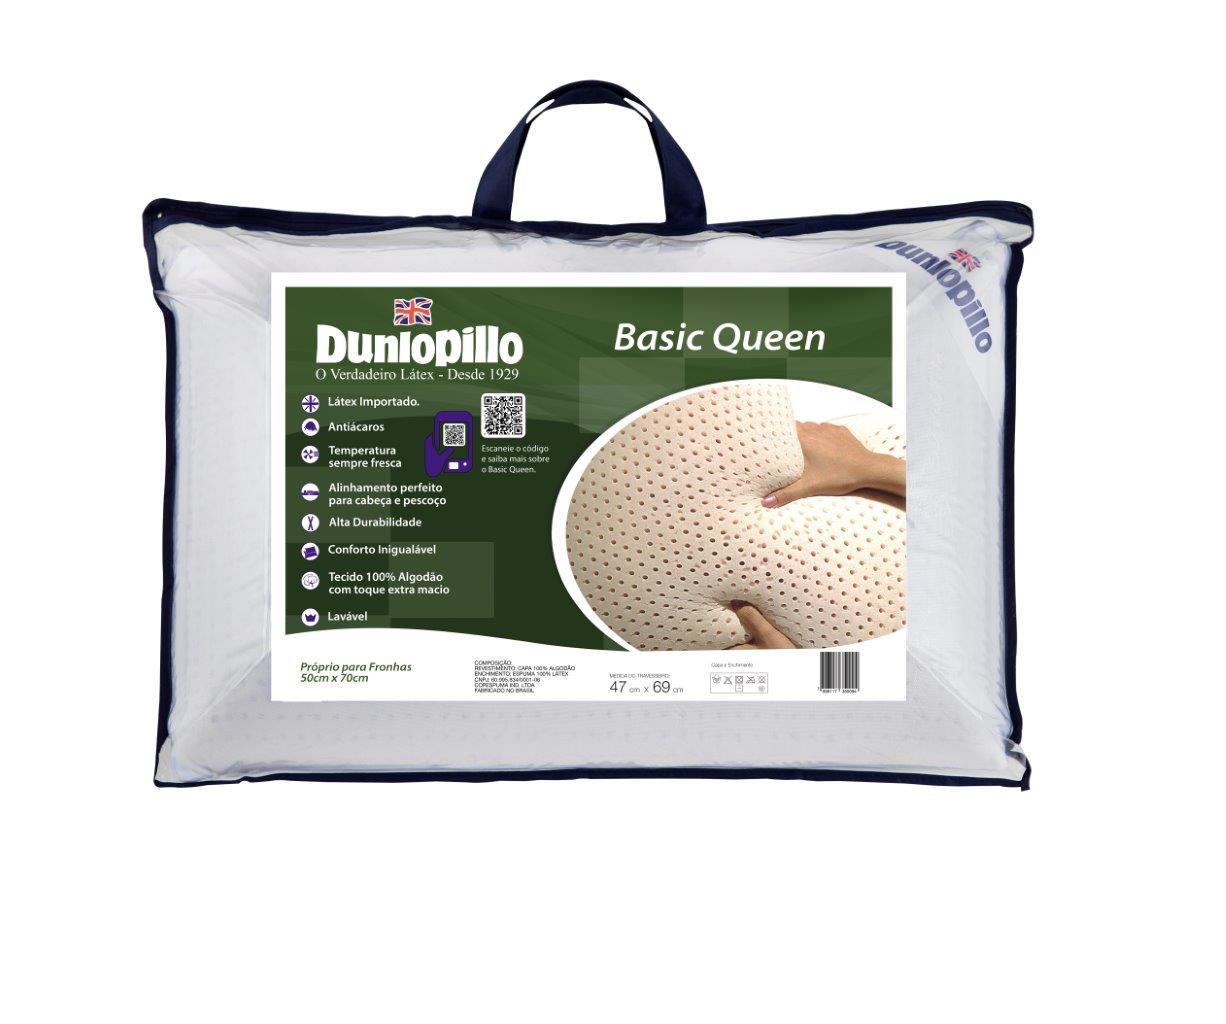 Kit 2 Travesseiros Basic Queen 0.50x0.70 100% Látex Natural - Dunlopillo